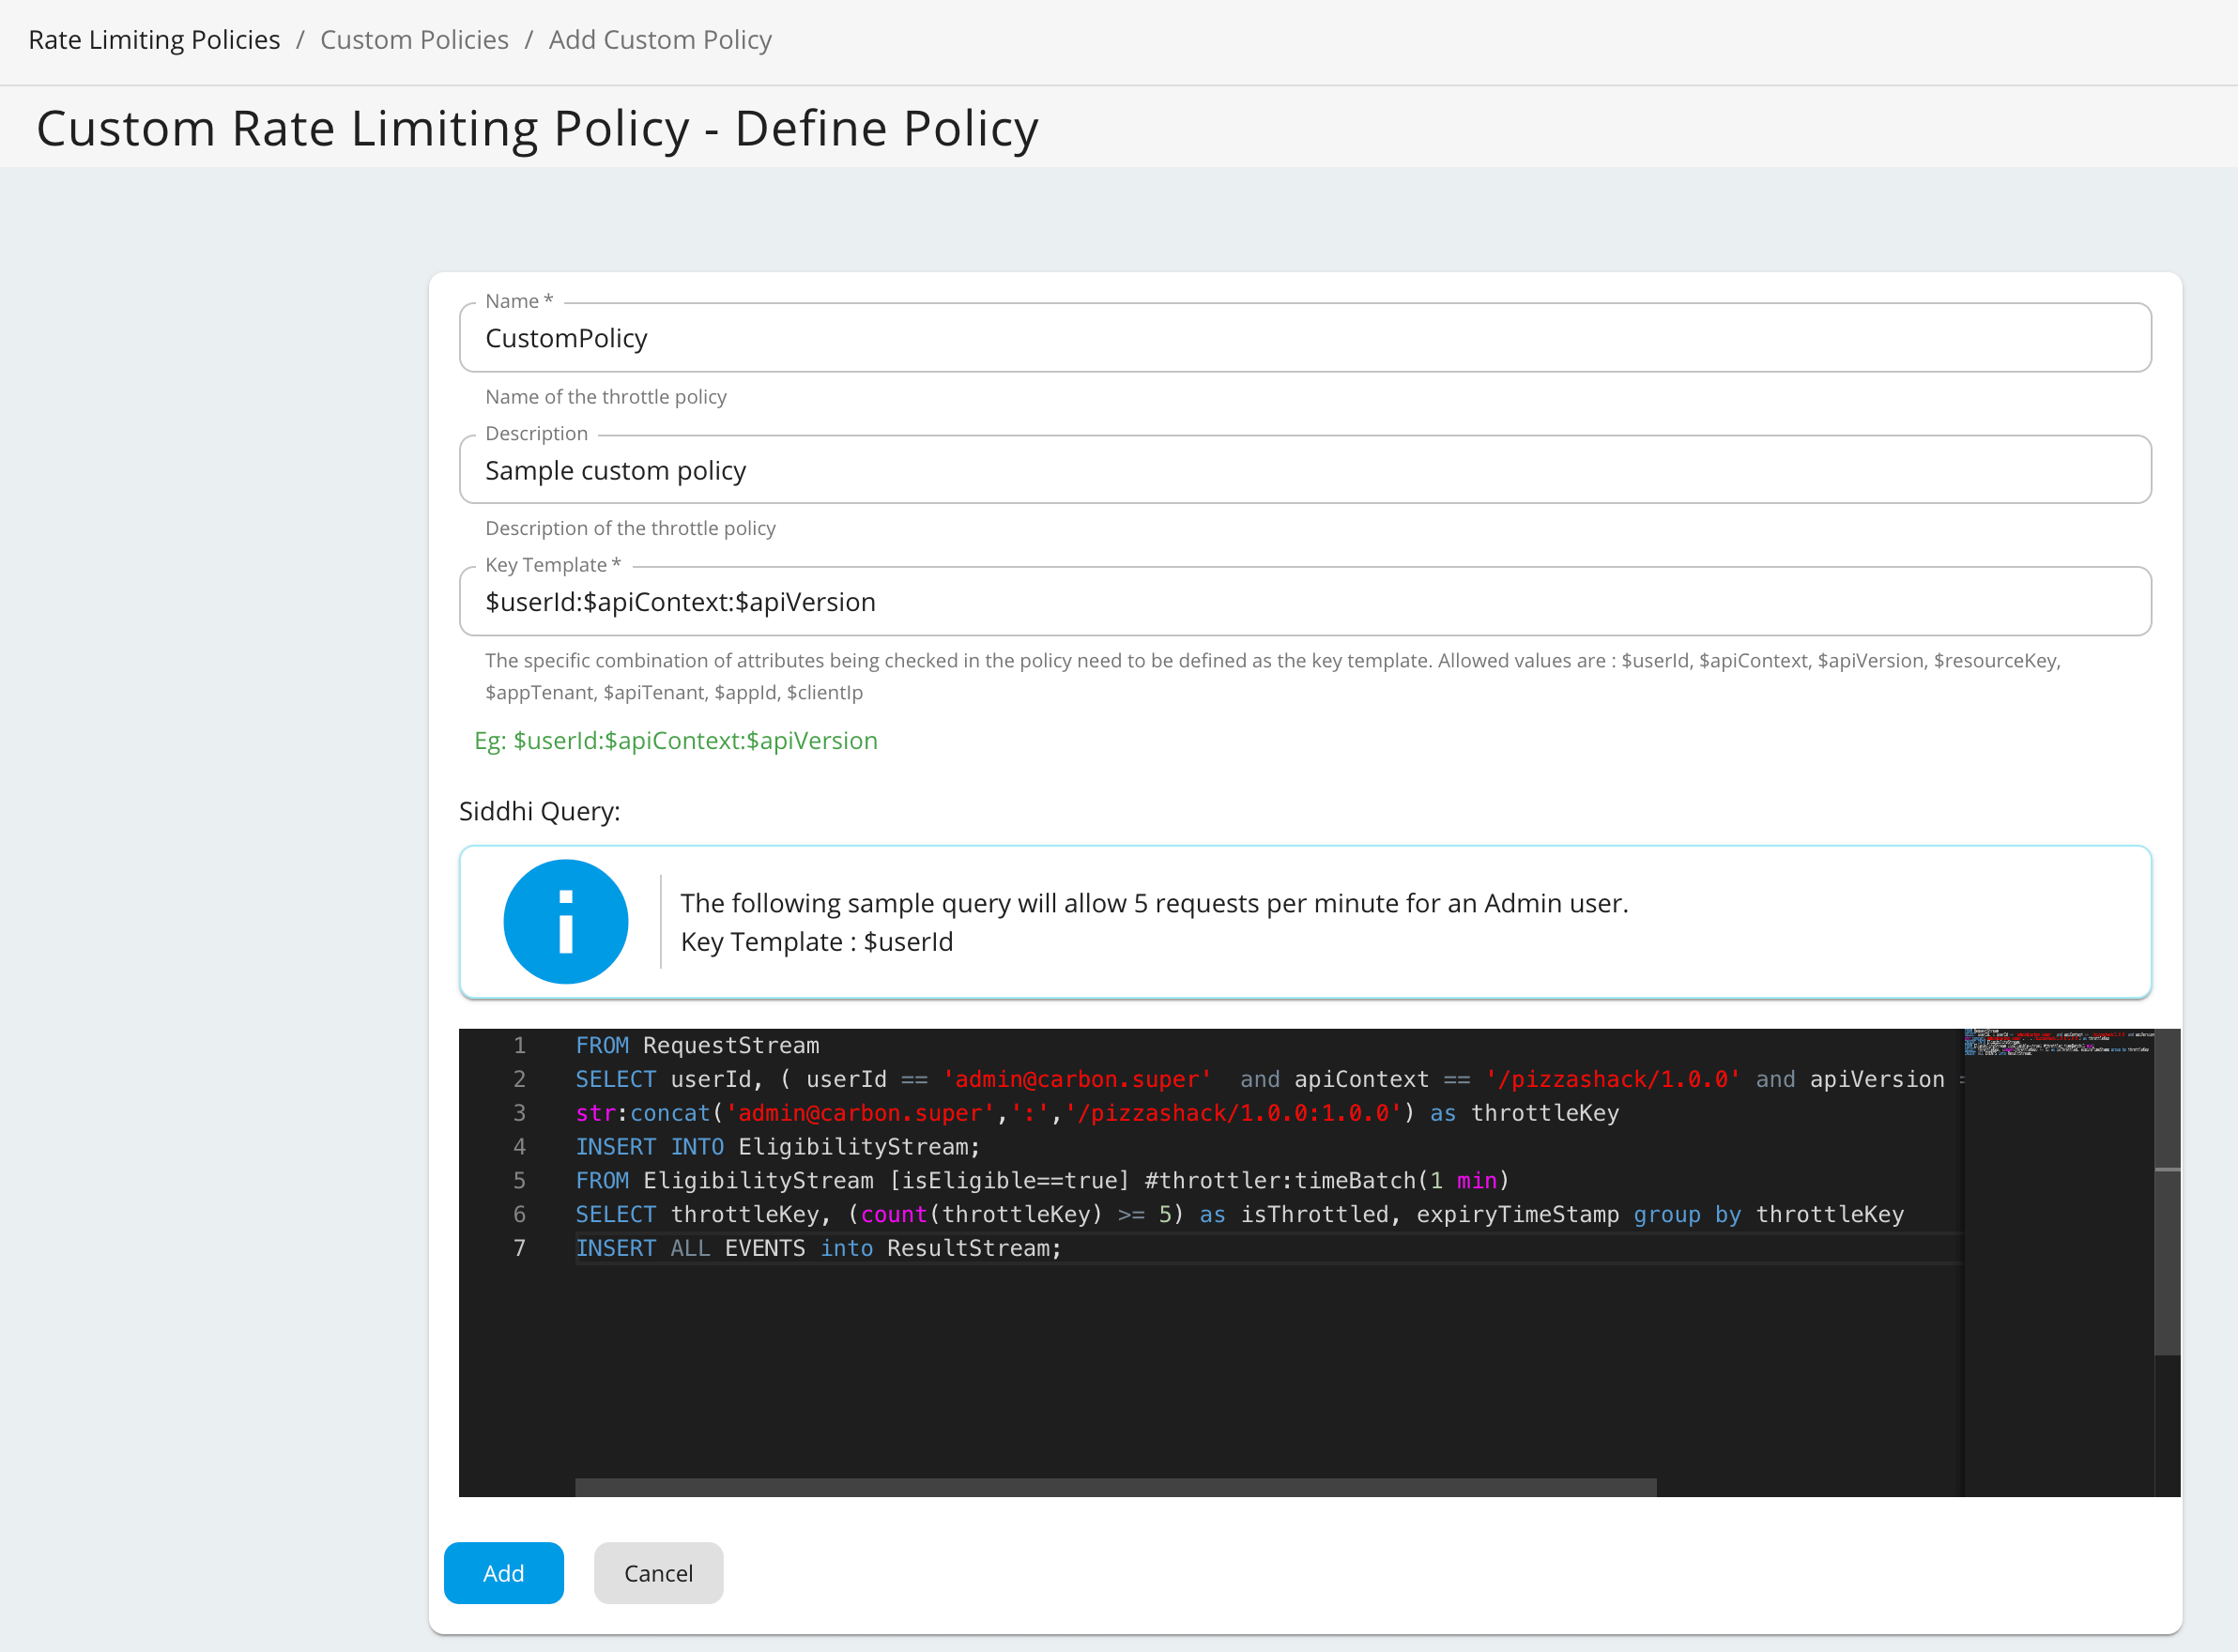 Add Custom policy page